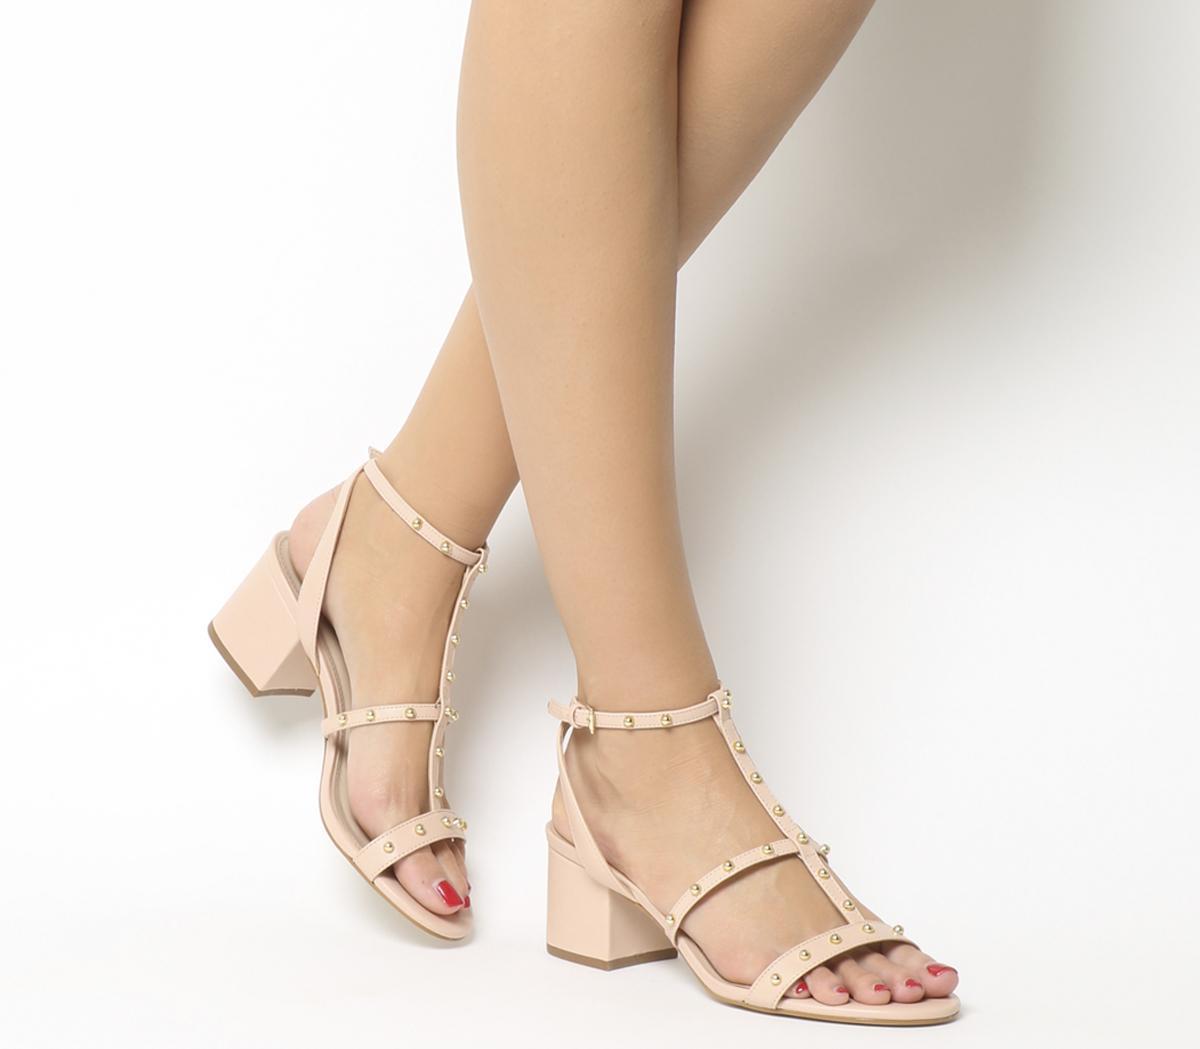 Midnight Studded Strappy Heels